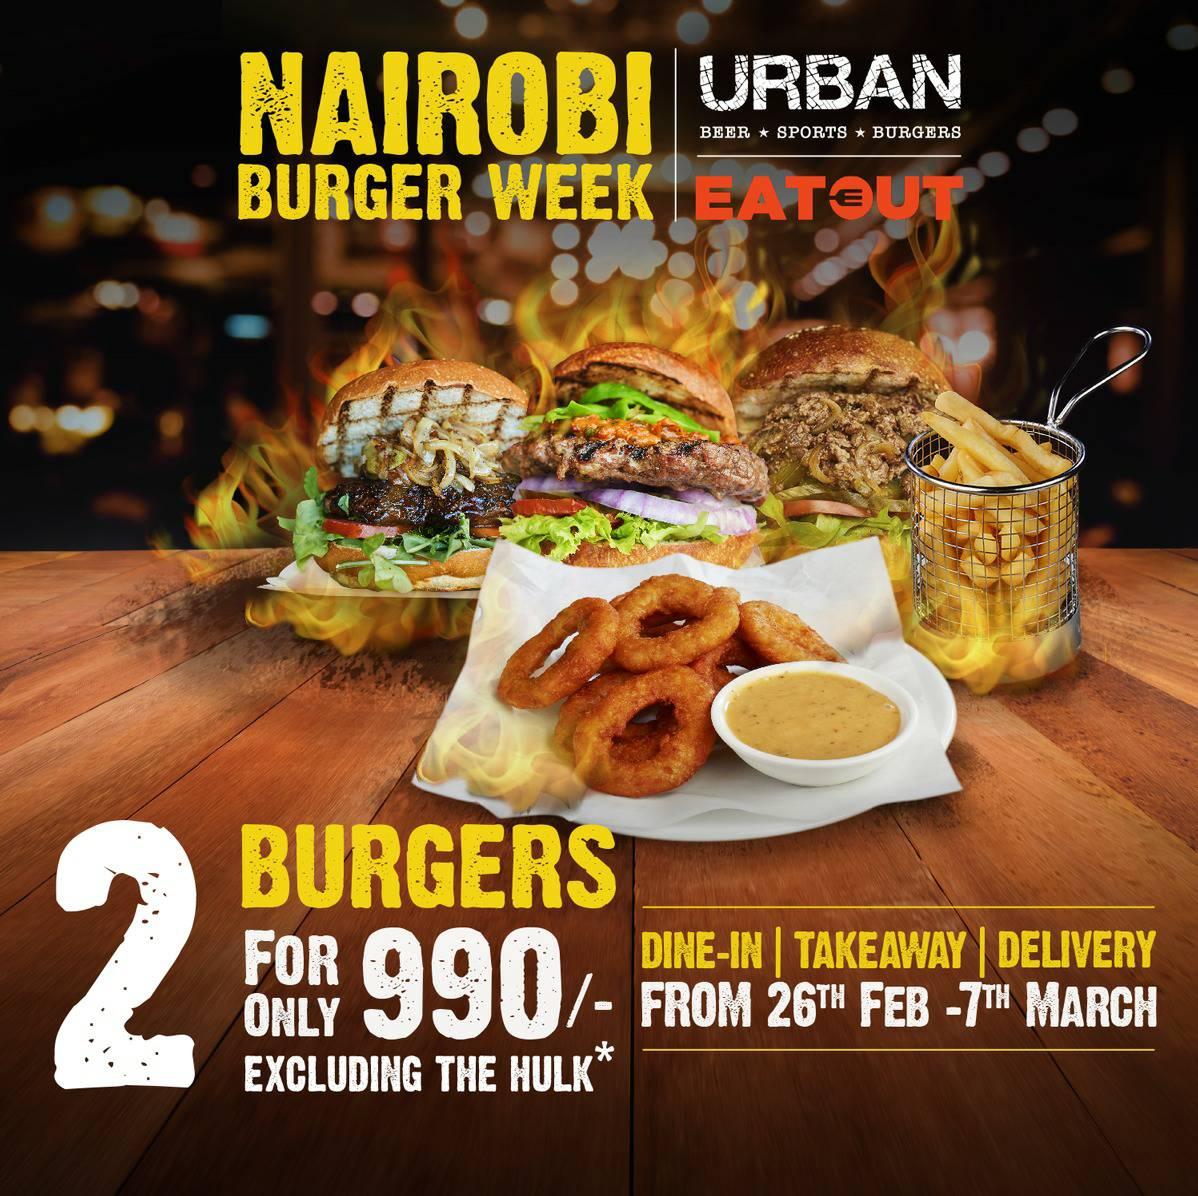 It's the last day of #NairobiBurgerWeek2021! Make it count! @urbanburgerke  #WestgateExperience https://t.co/2O5e6jNtLb